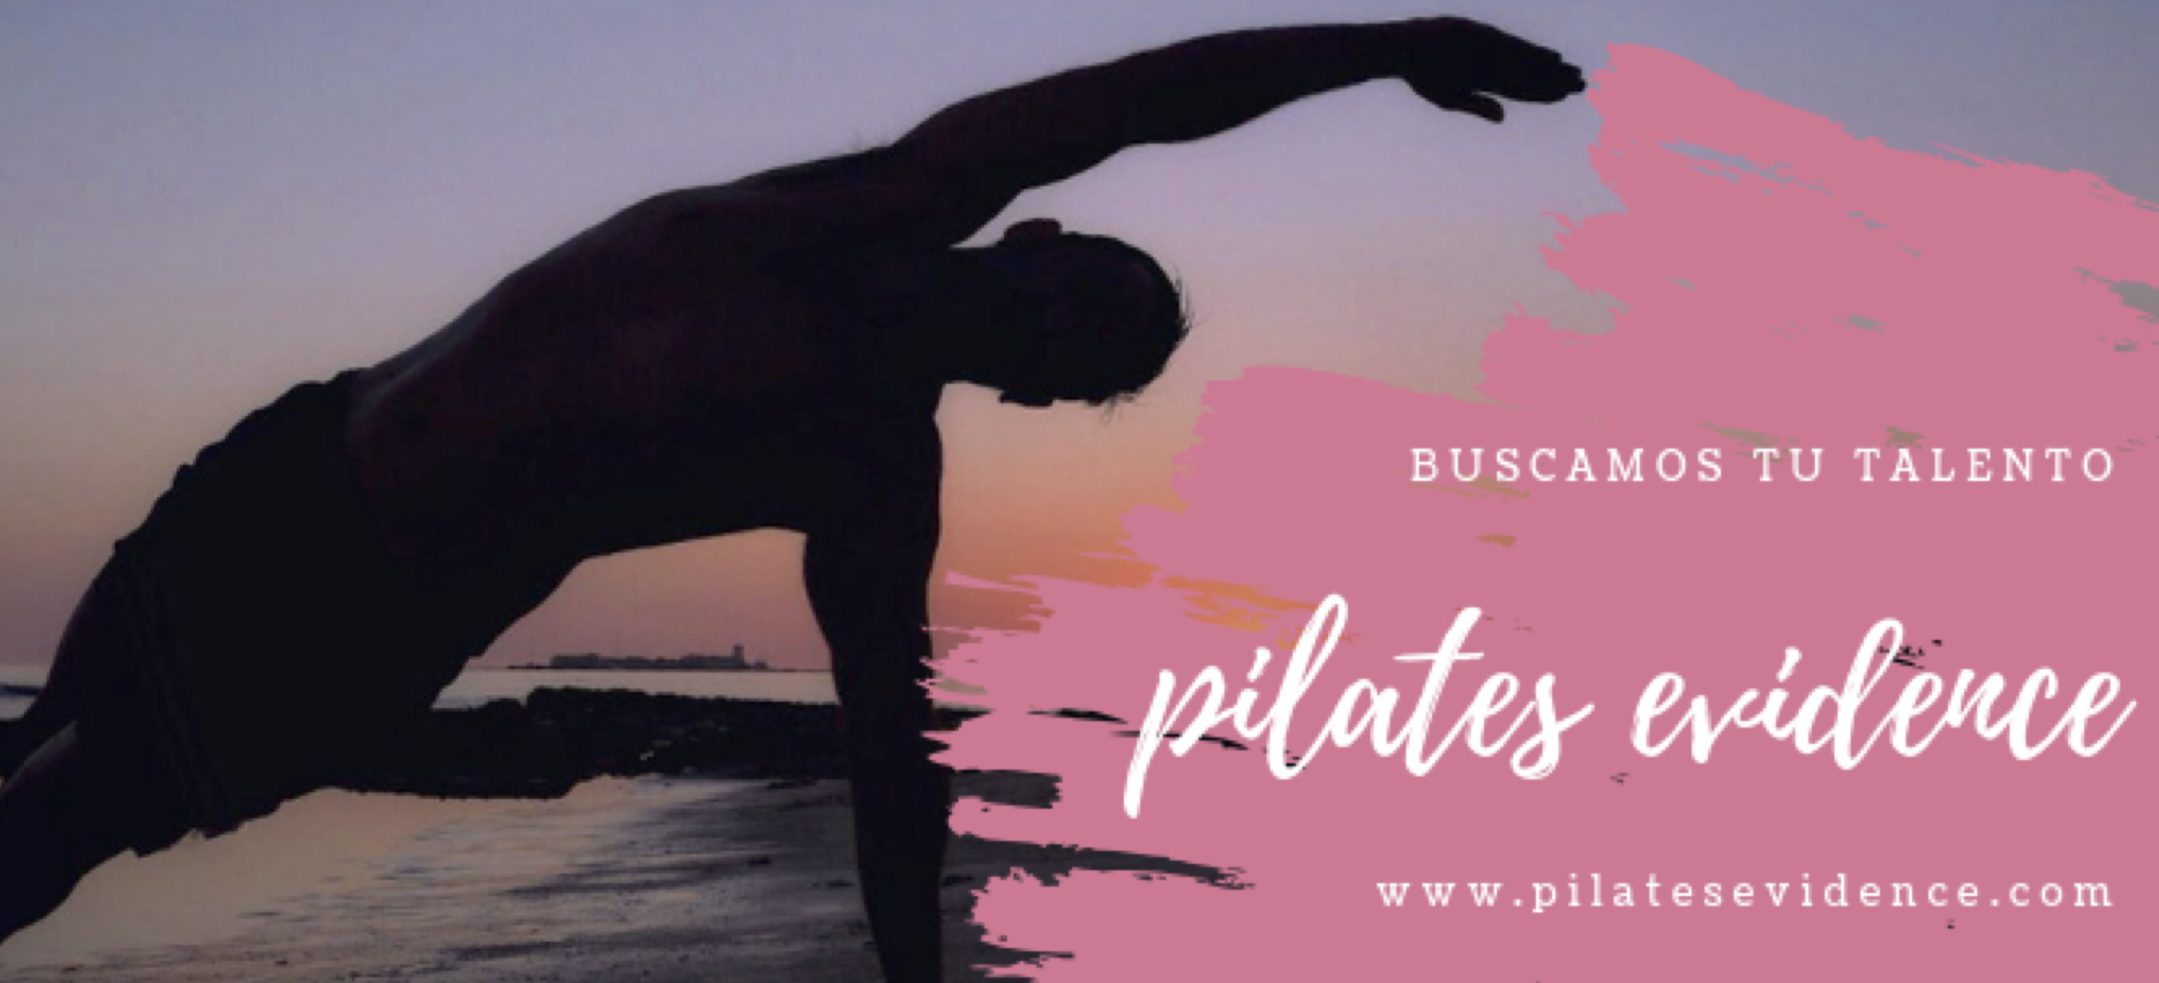 buscamos tu talento pilates